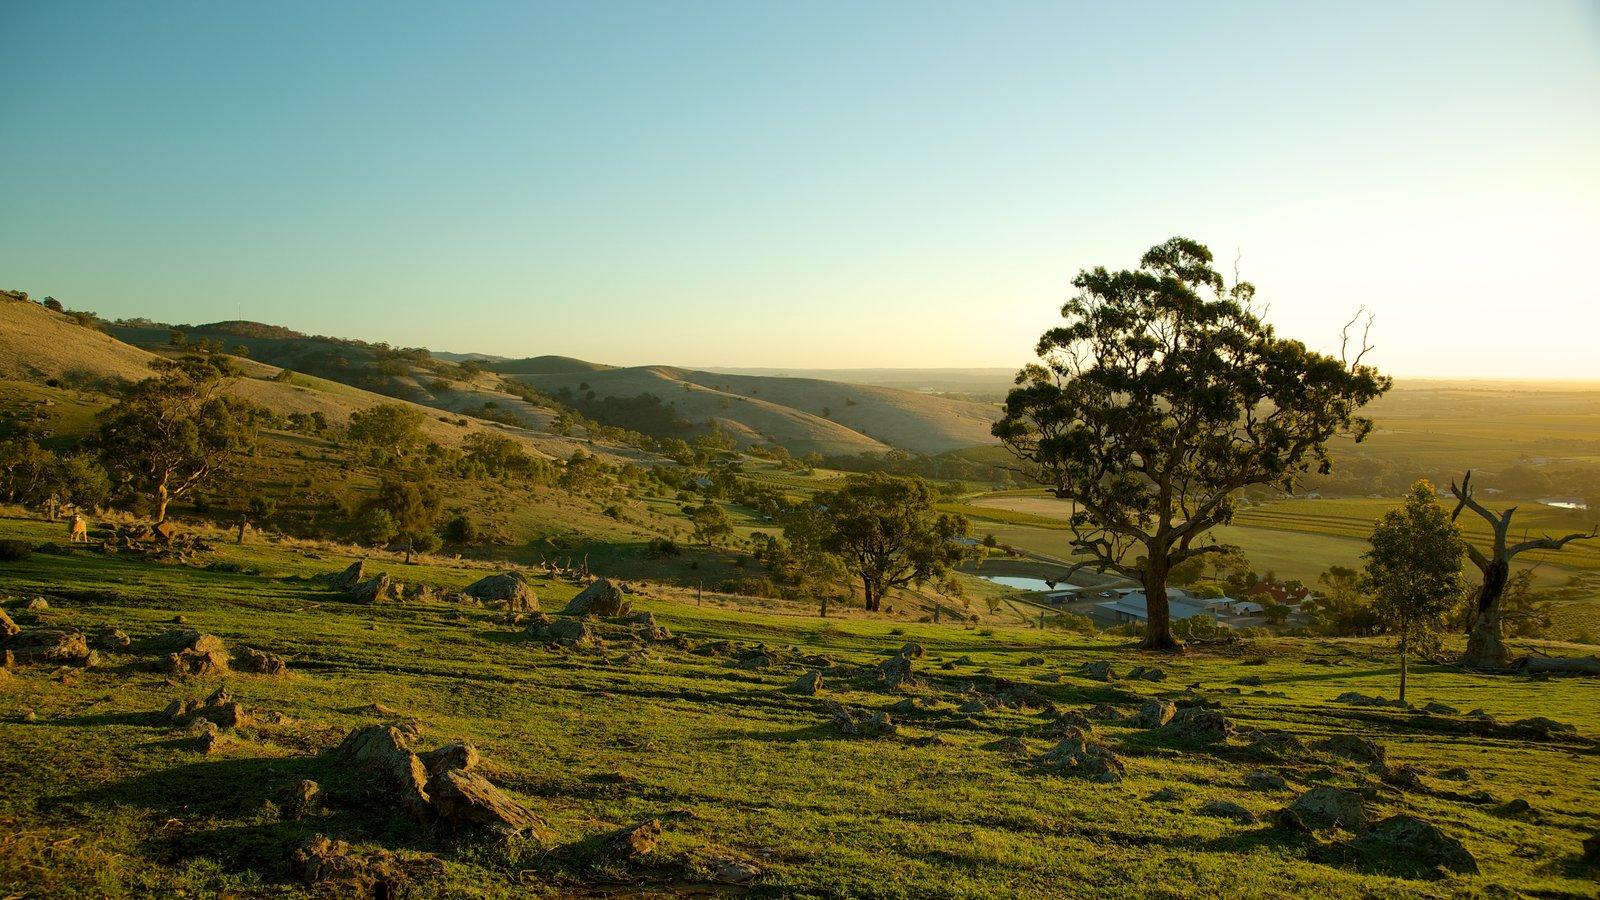 Landscape pictures view images of south australia for Adelaide hills landscape